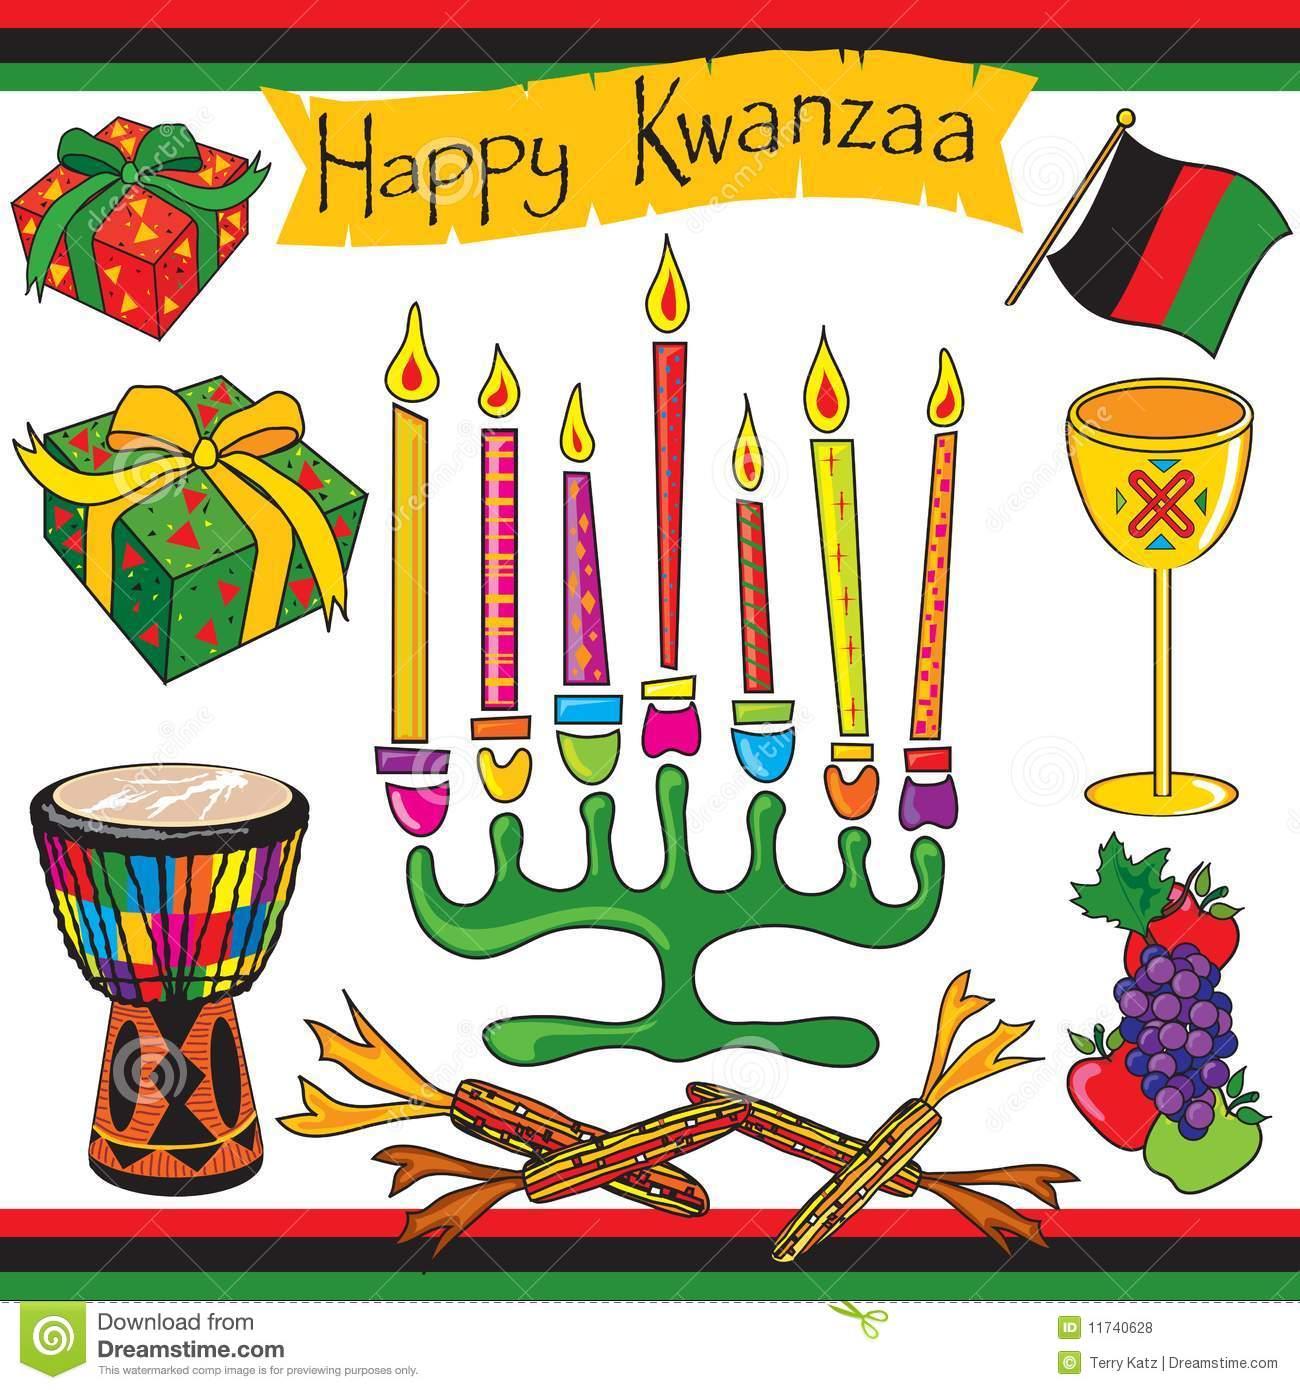 Happy Kwanzaa Clip Art And Icons Royalty Free Stock Photos.